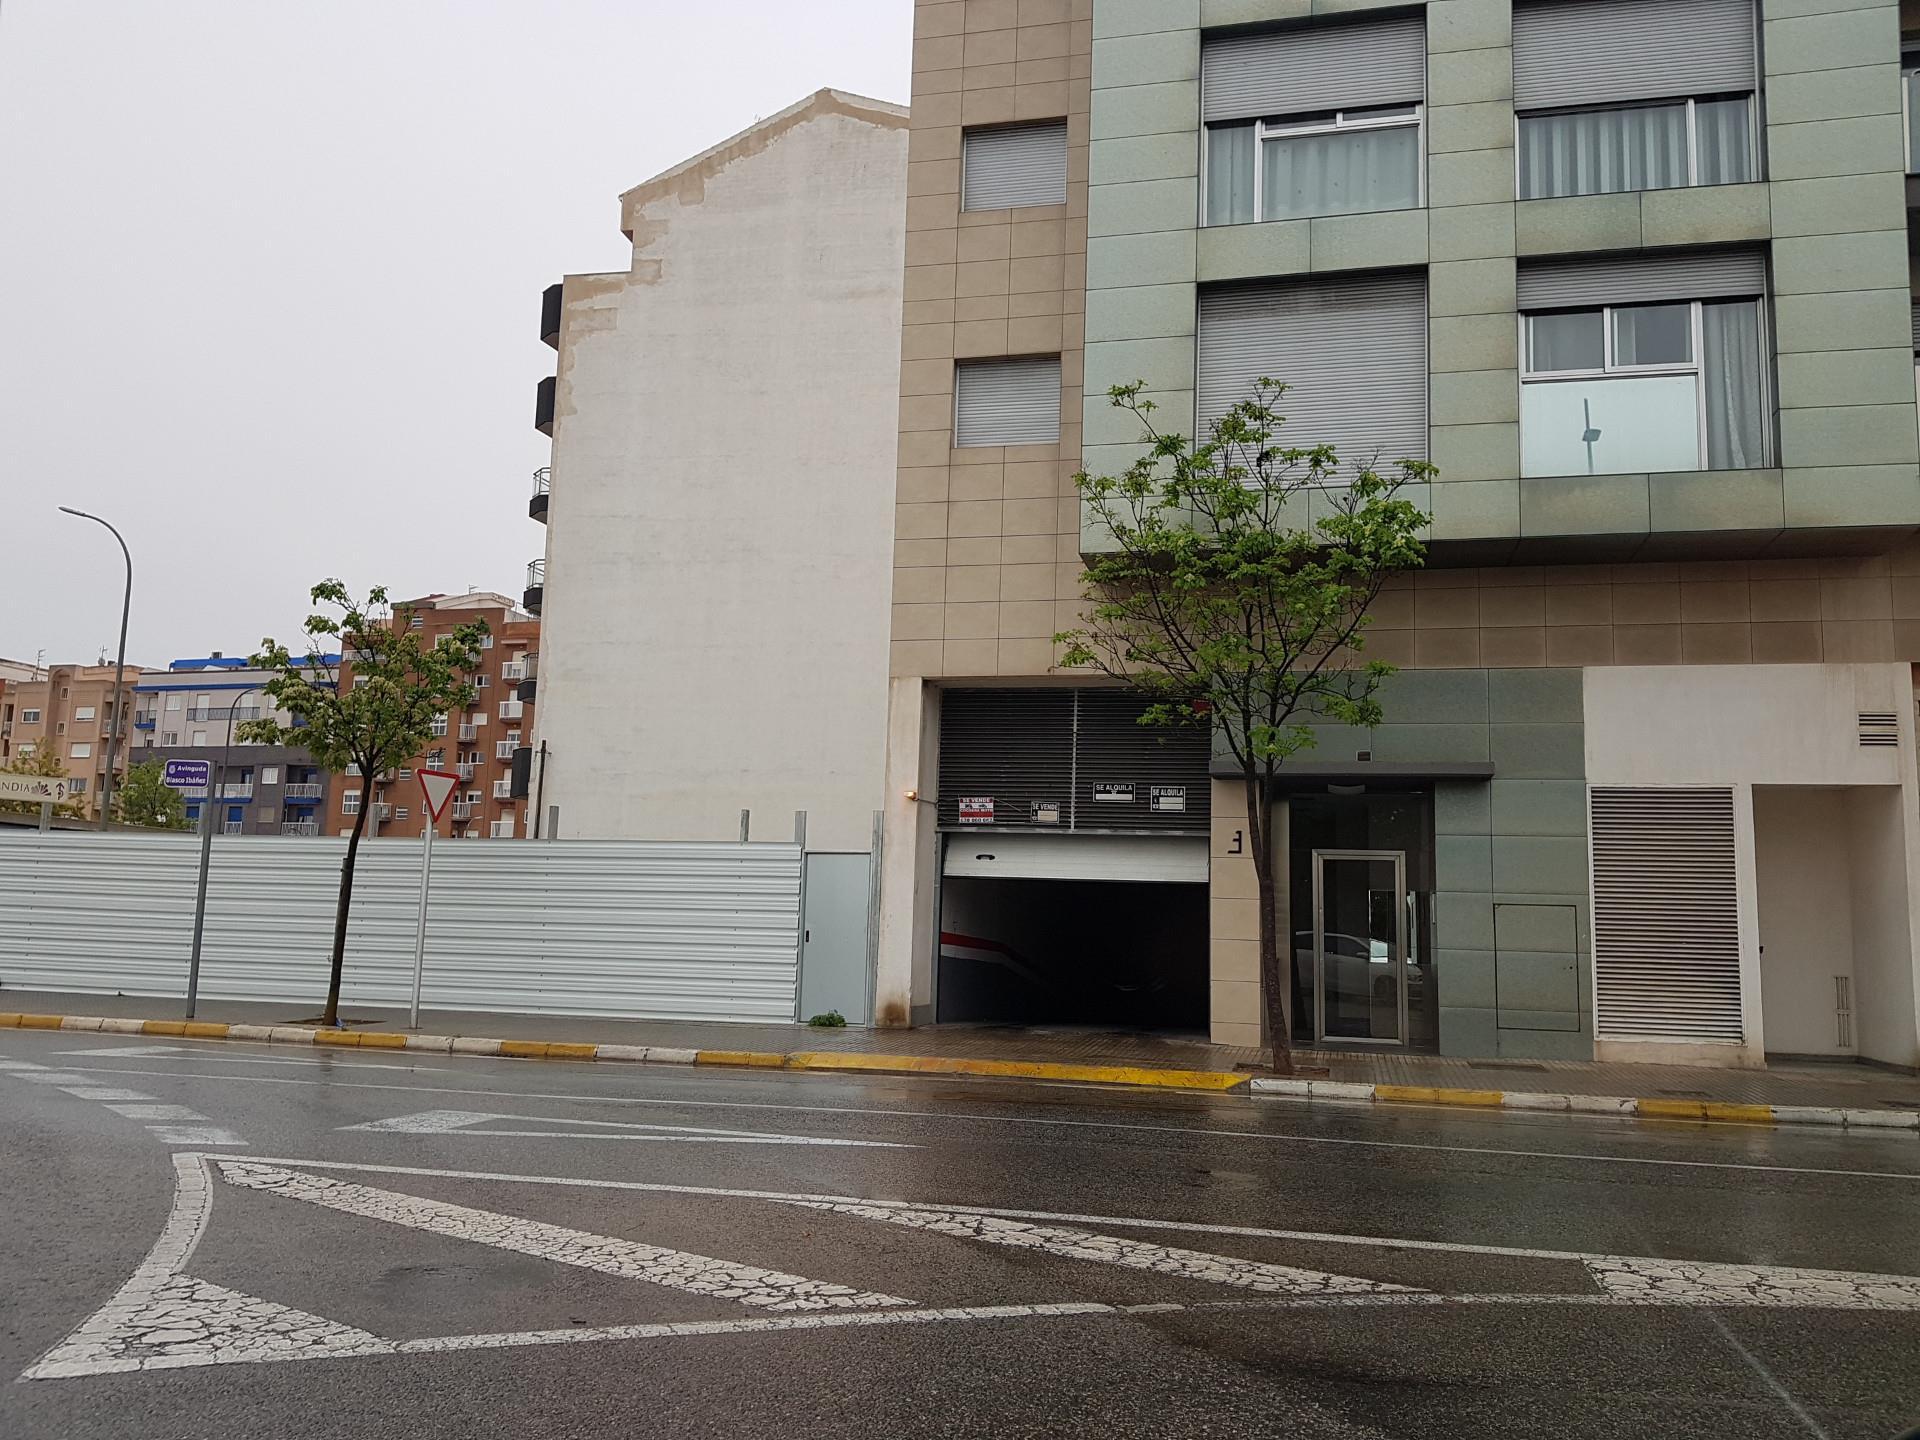 Parking coche  Avenida de blasco ibáñez. Urbanizaciones  - santa anna - las estrellas